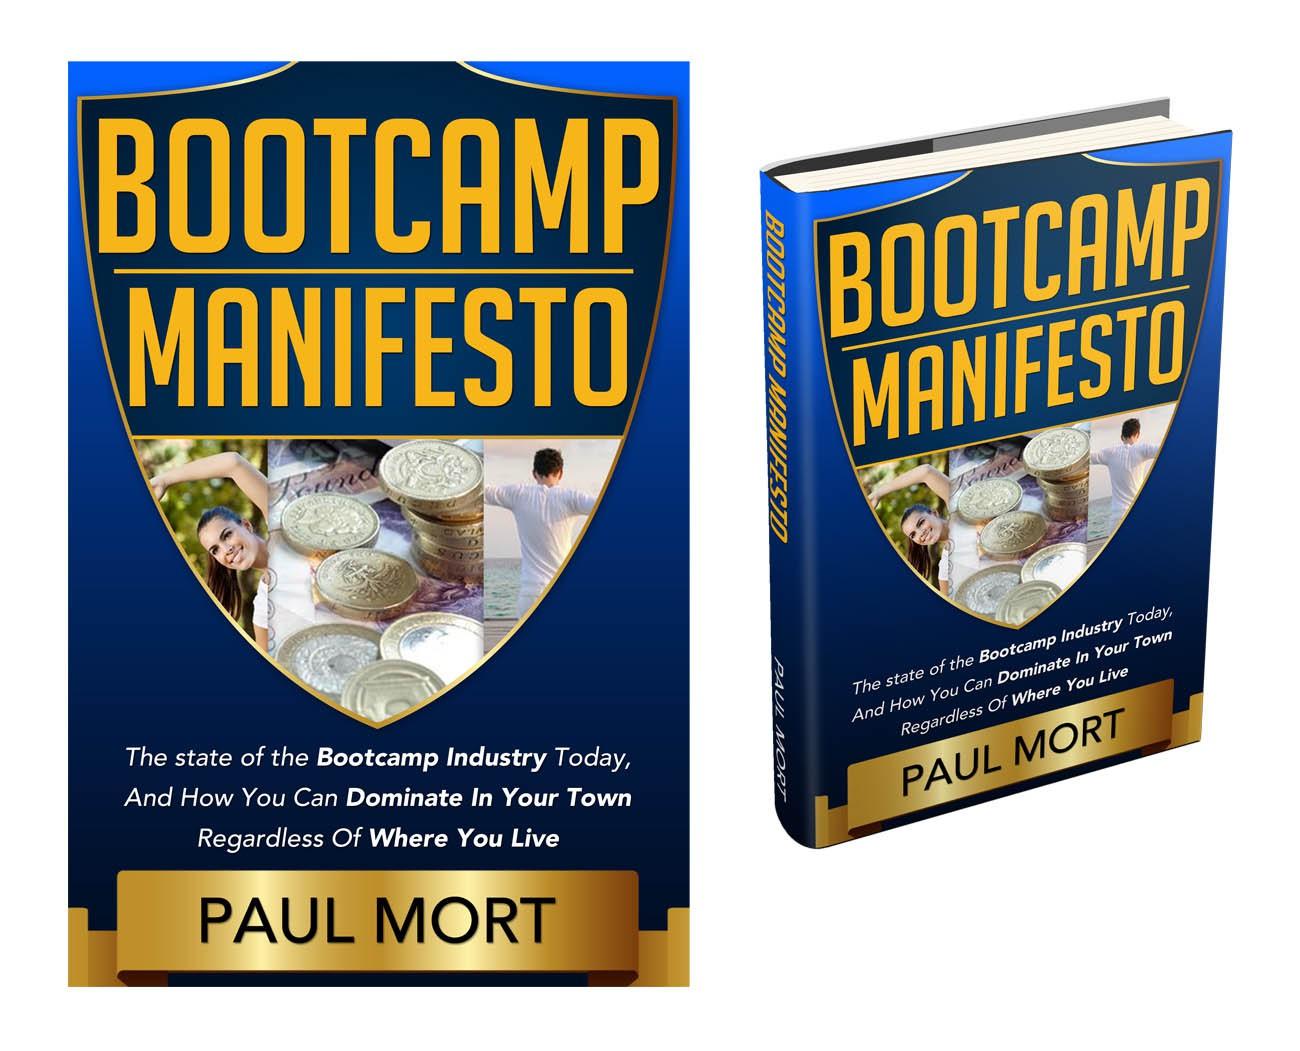 Create the next book or magazine cover for Bootcampking.com